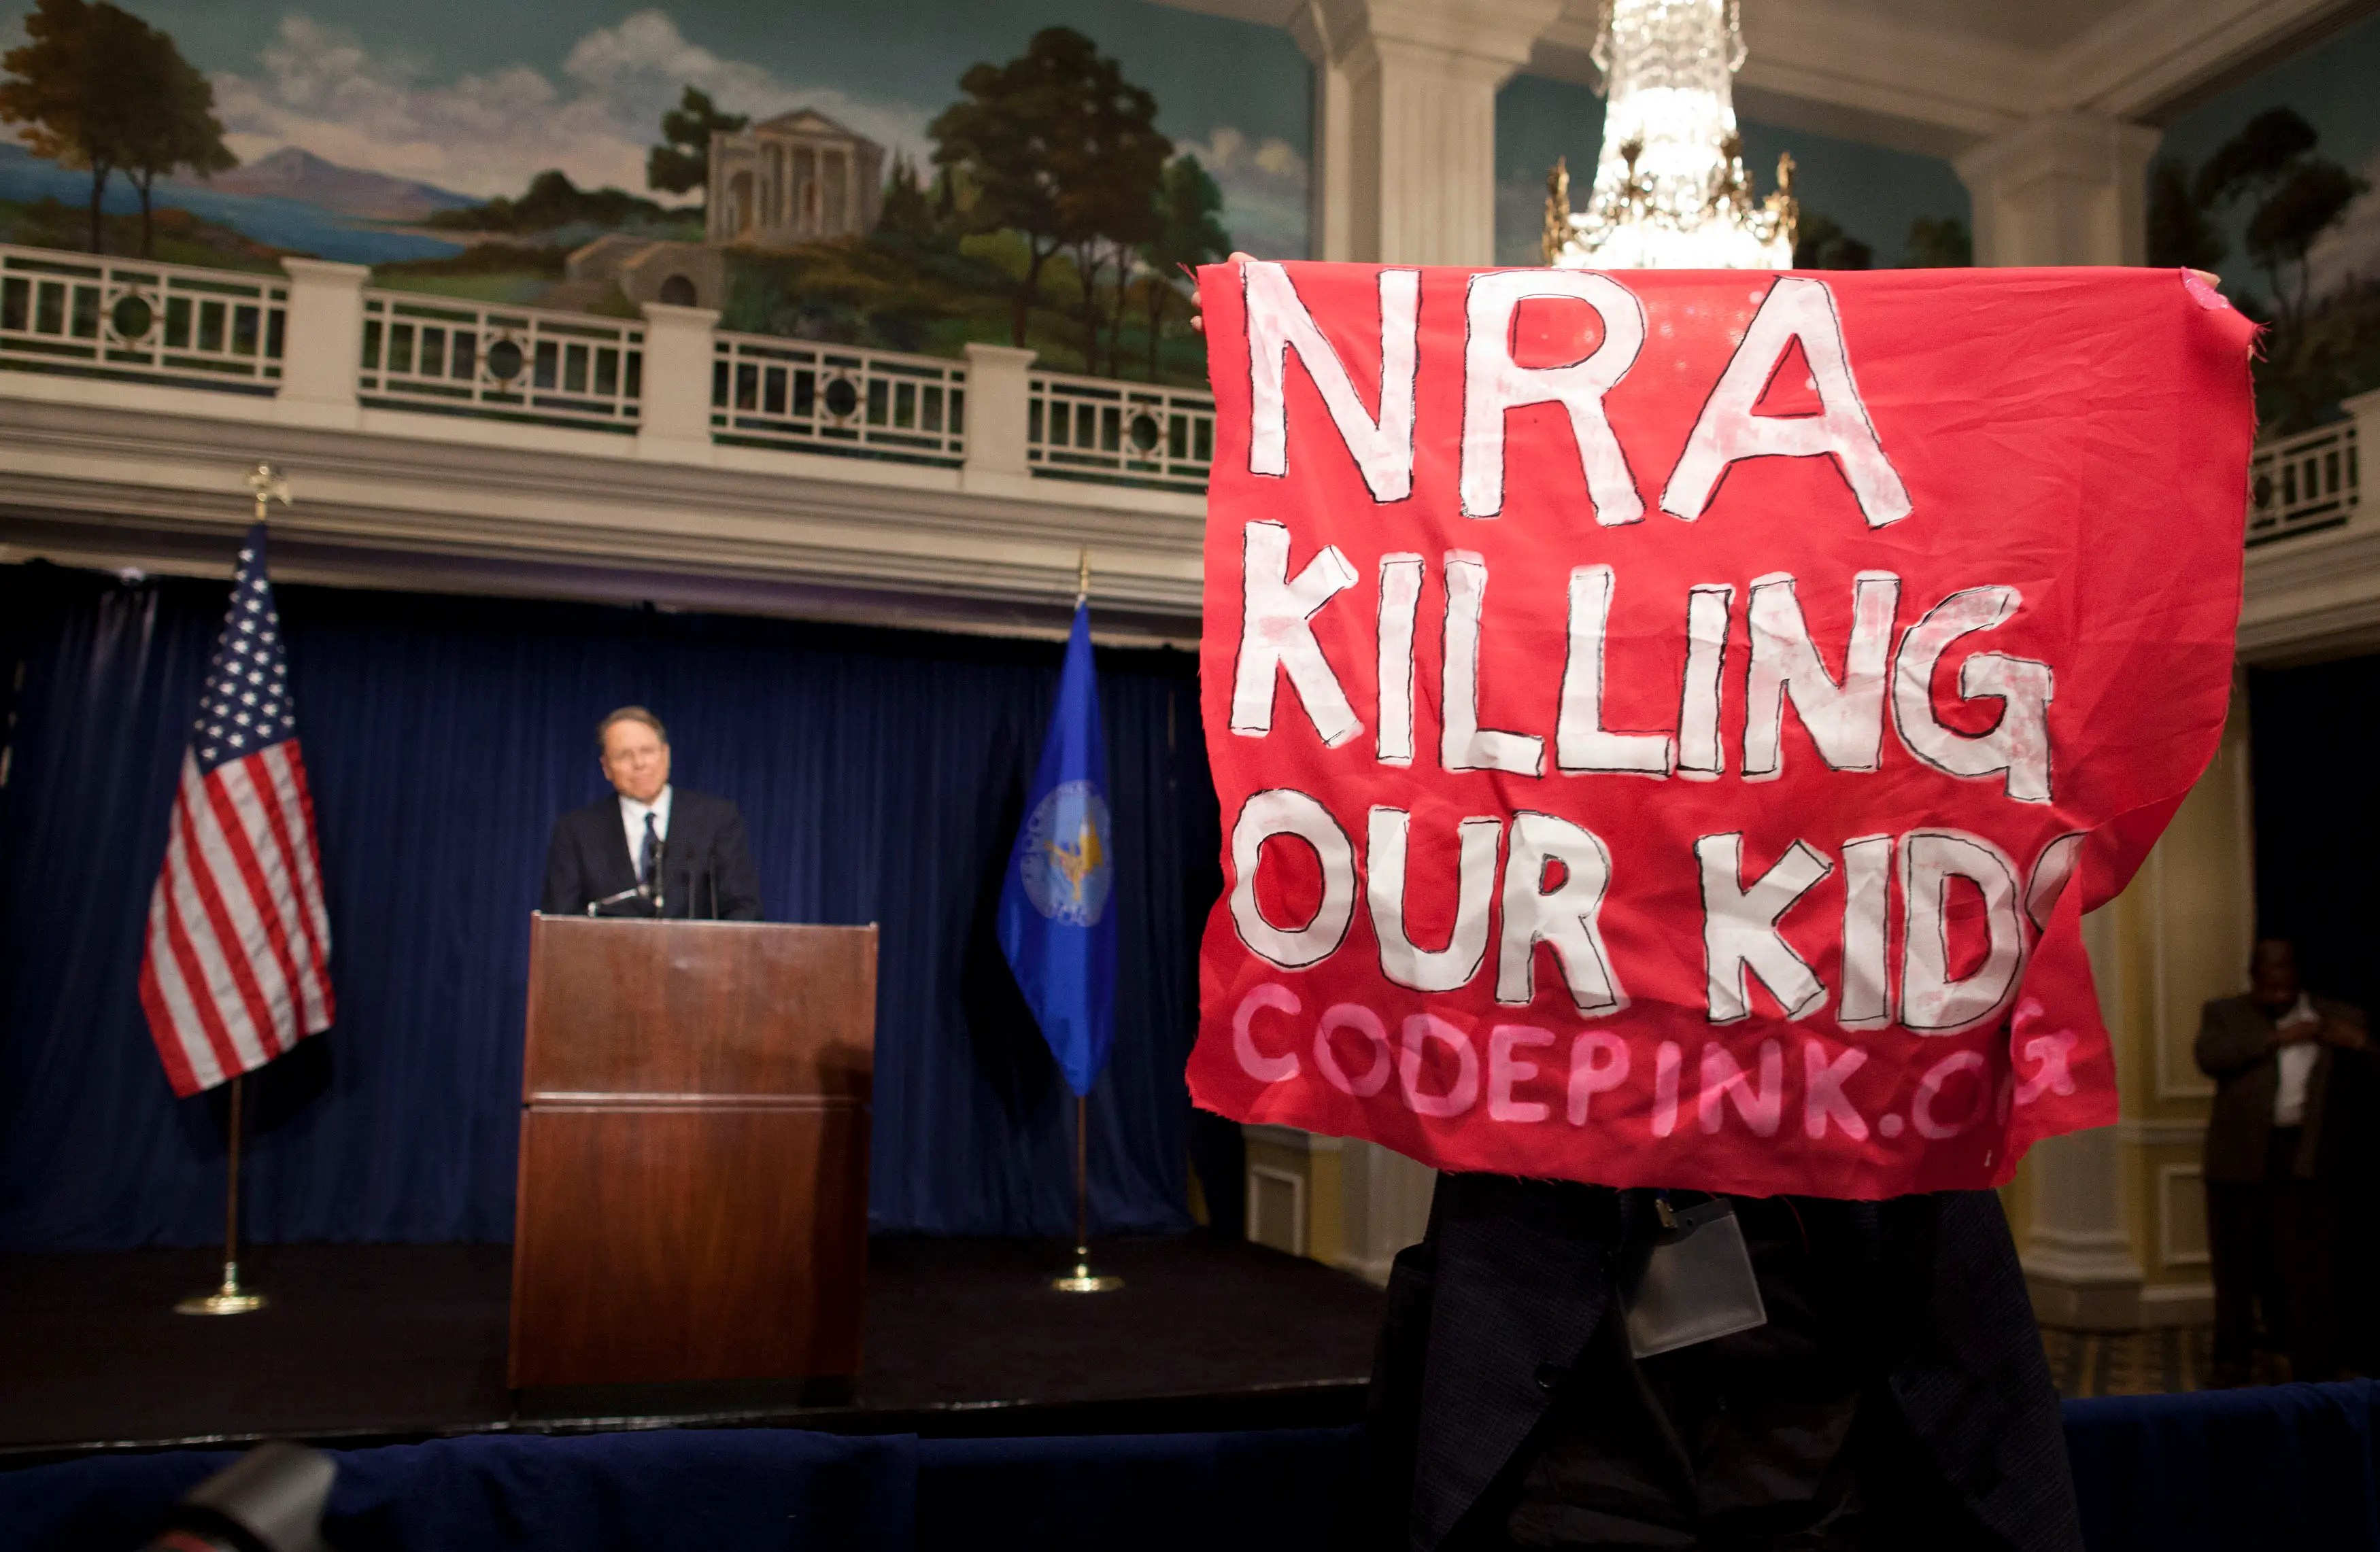 Protester at NRA Press Conference, Protester, Gun control